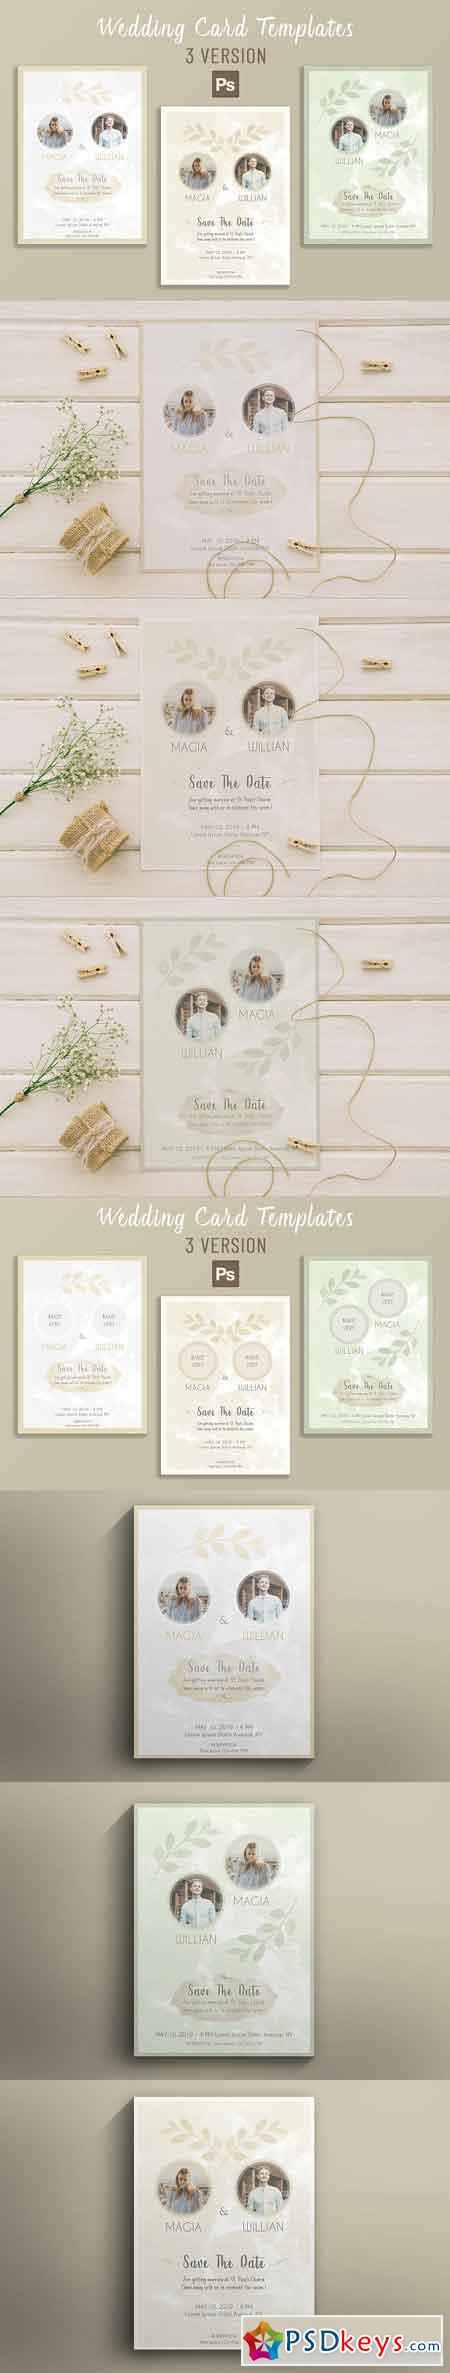 Wedding Card Template 2795019